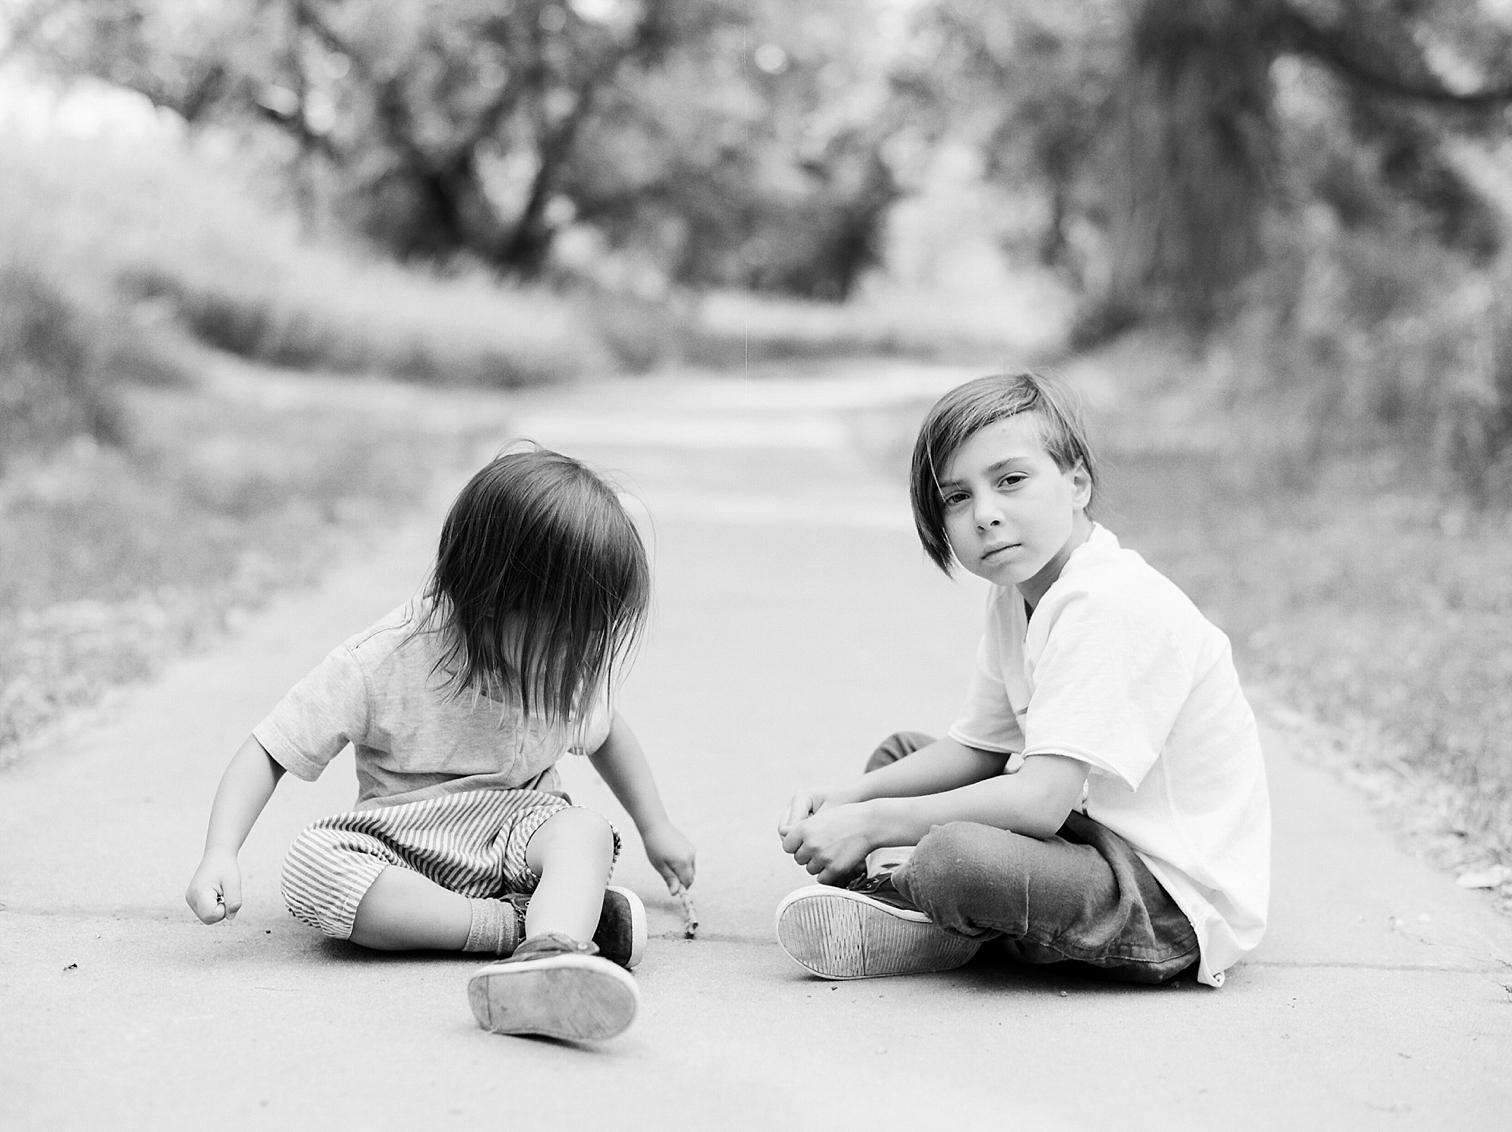 Film Photographers, Colorado Family Portraits, Fort Collins Portrait Photographer, Summer Family Portraits, Black and White Children's Portraits, Danielle DeFiore Photography